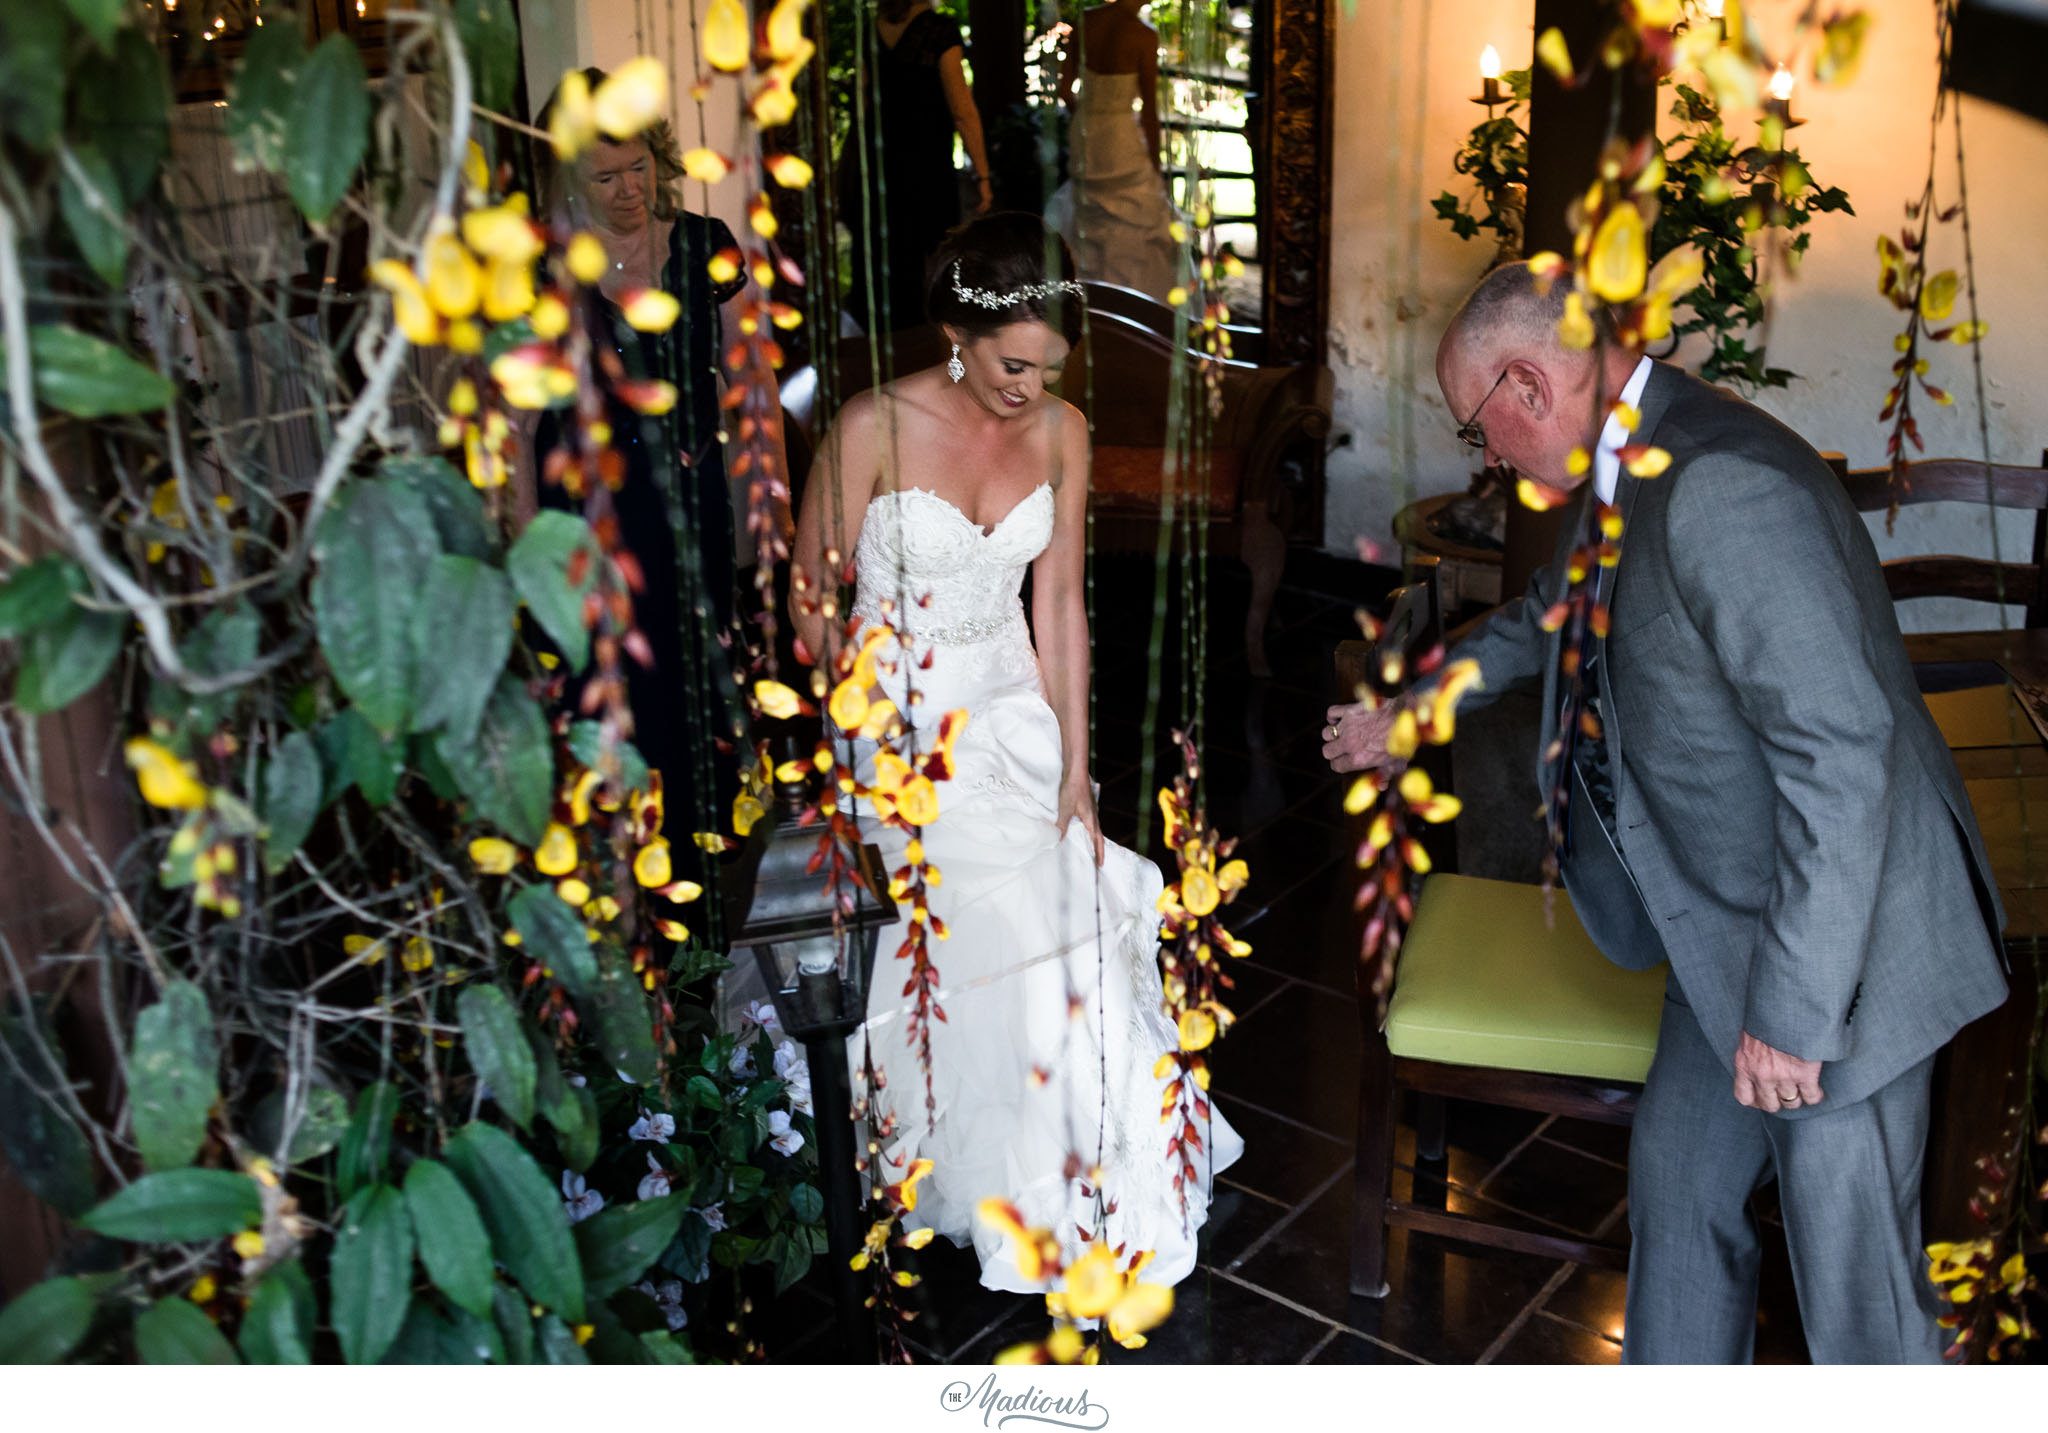 Leigh_Rob_Antigua_Guatemala_Santa_Clara_Destination_Wedding_27.JPG